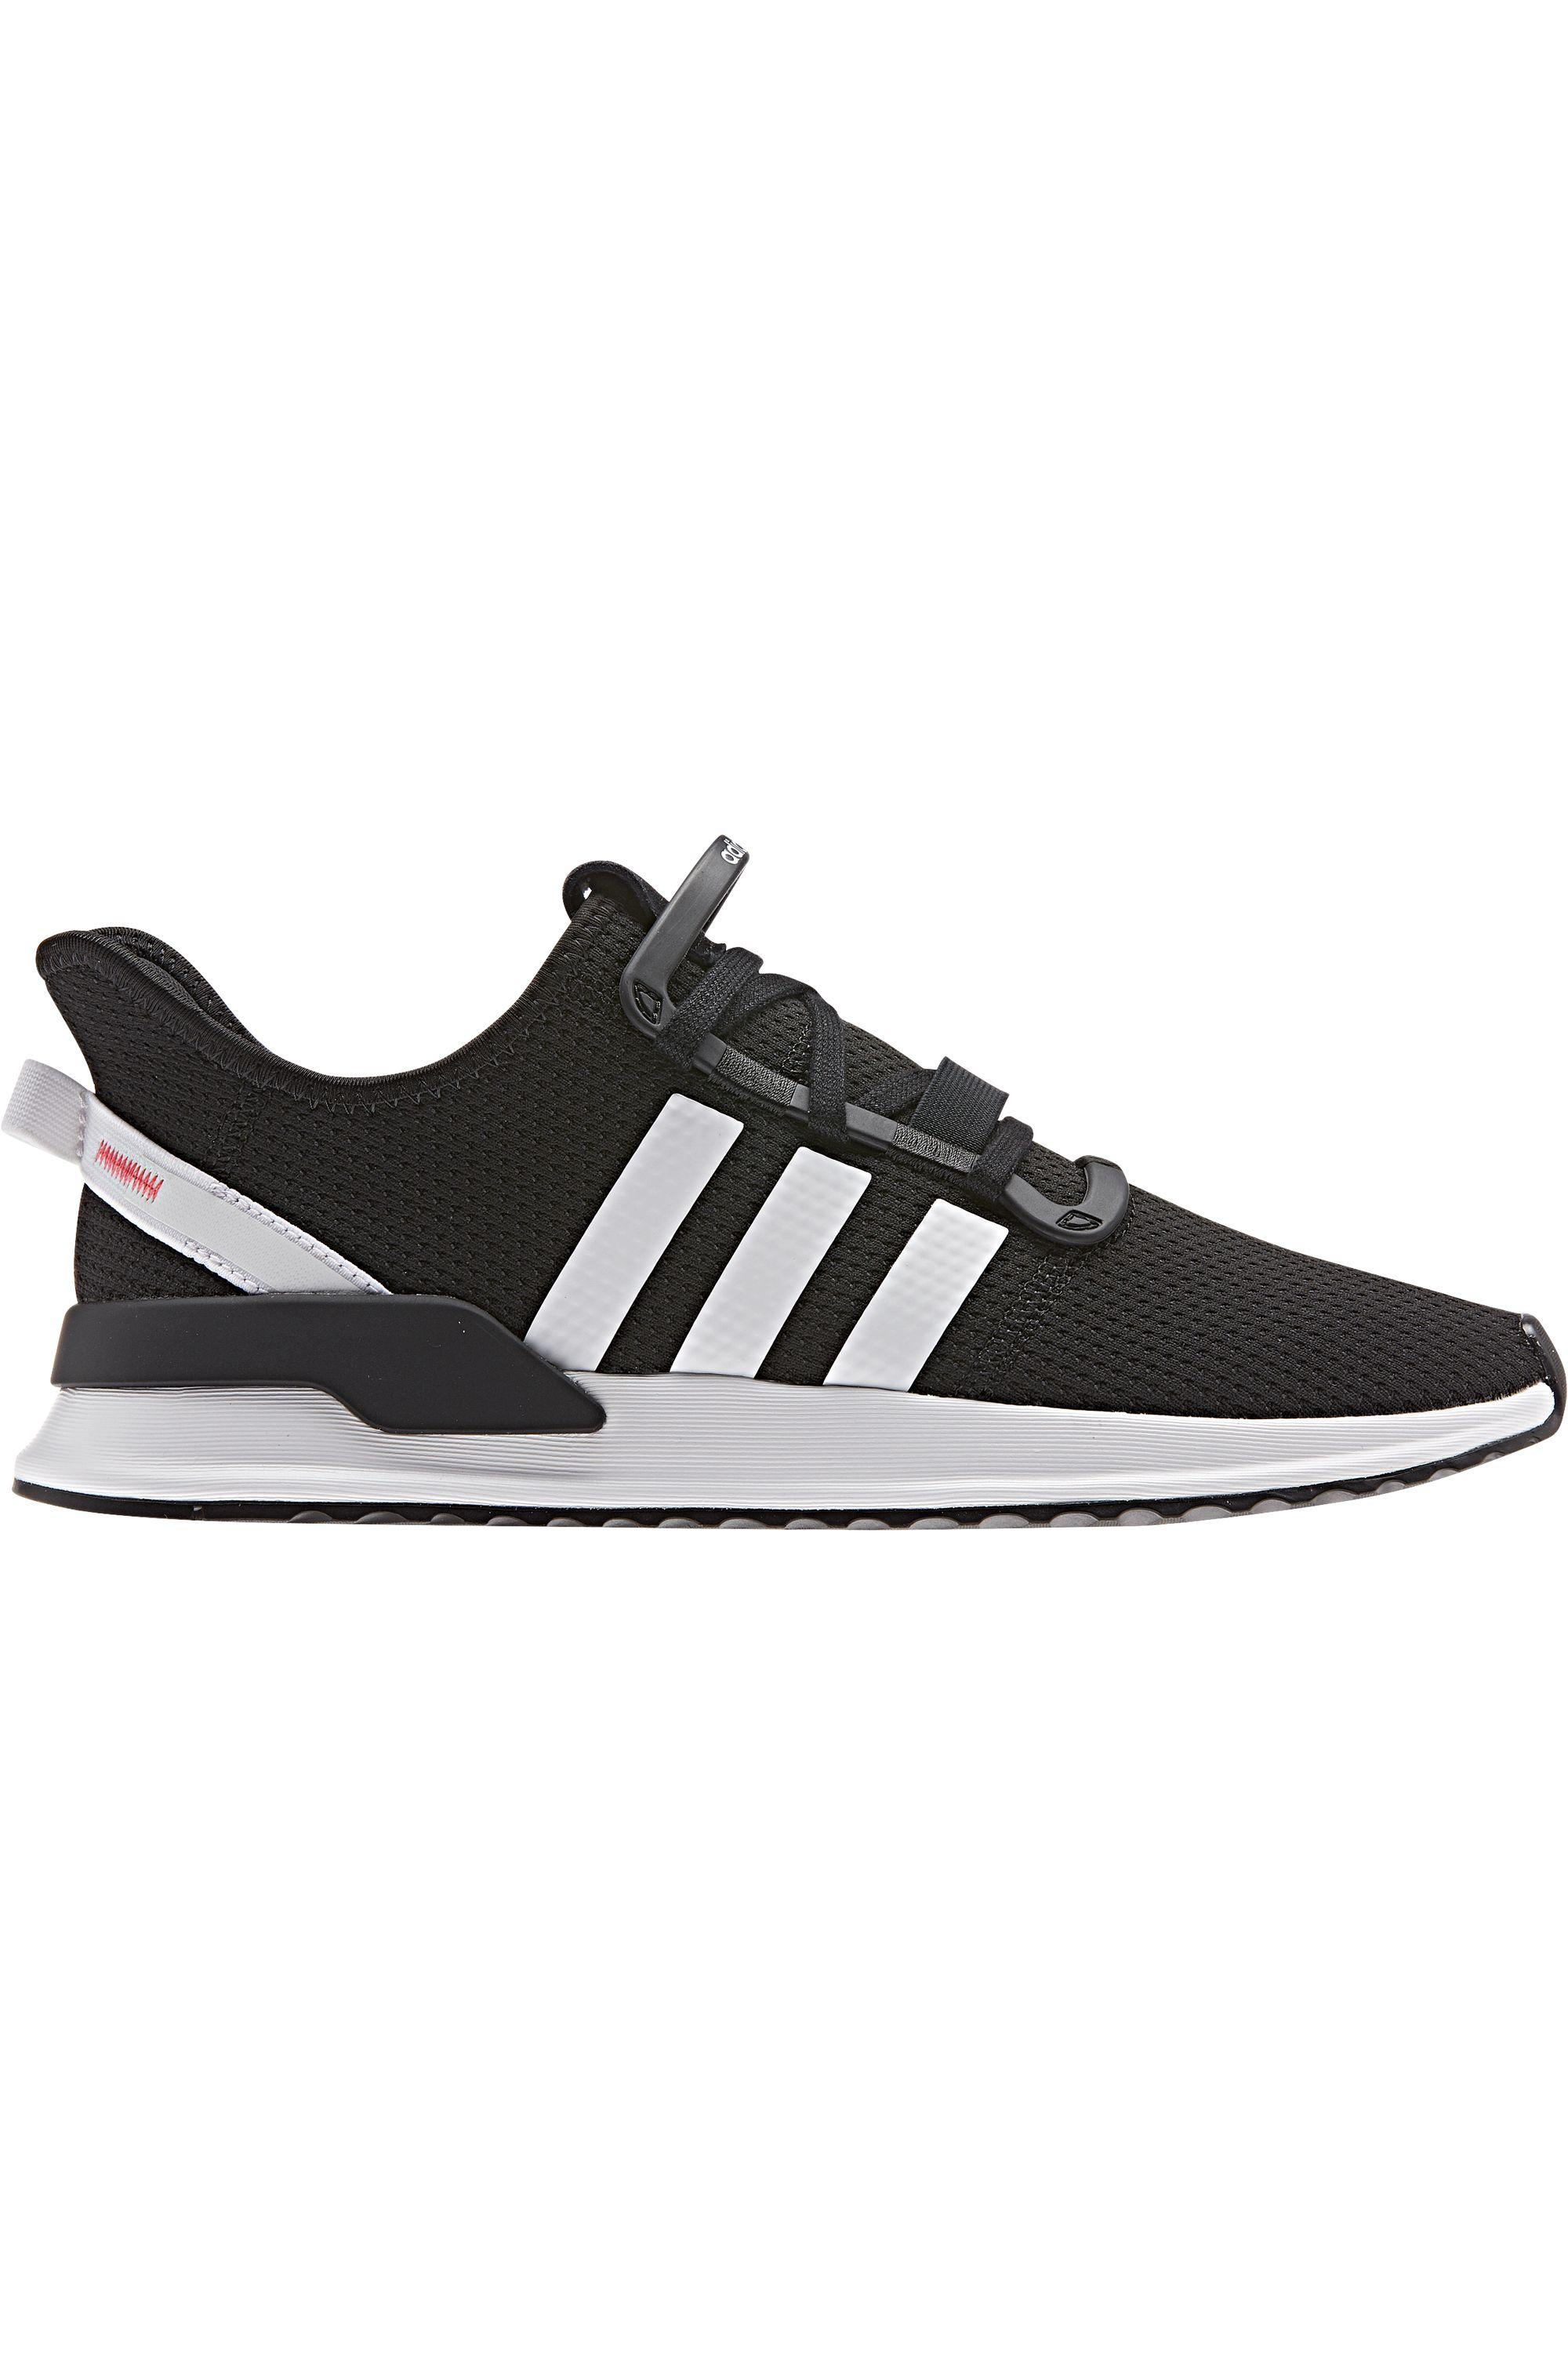 Tenis Adidas U_PATH RUN Core Black/Ash Grey S18/Core Black